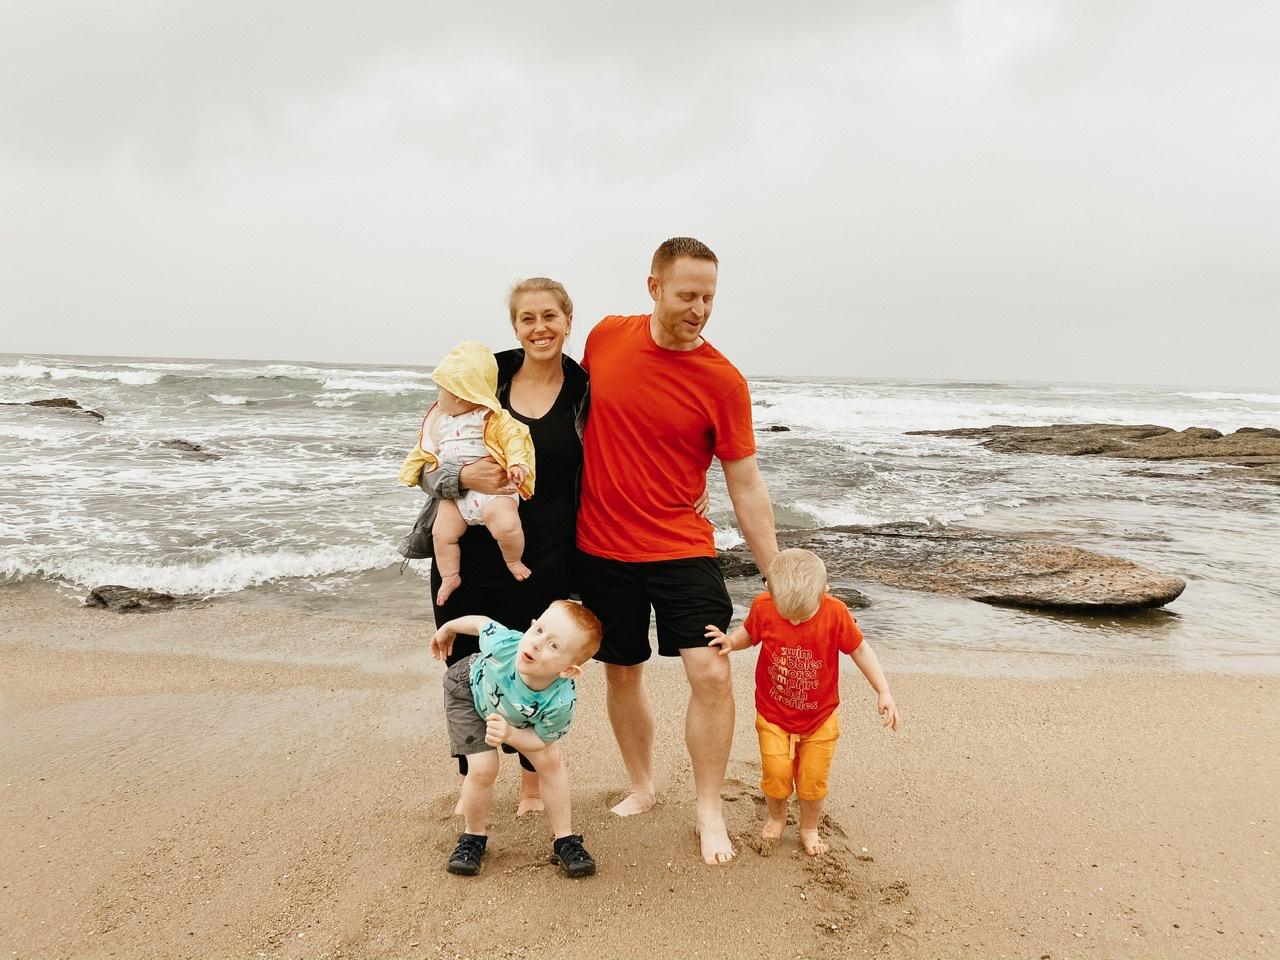 visiting Shelly beach in KwaZulu-Natal